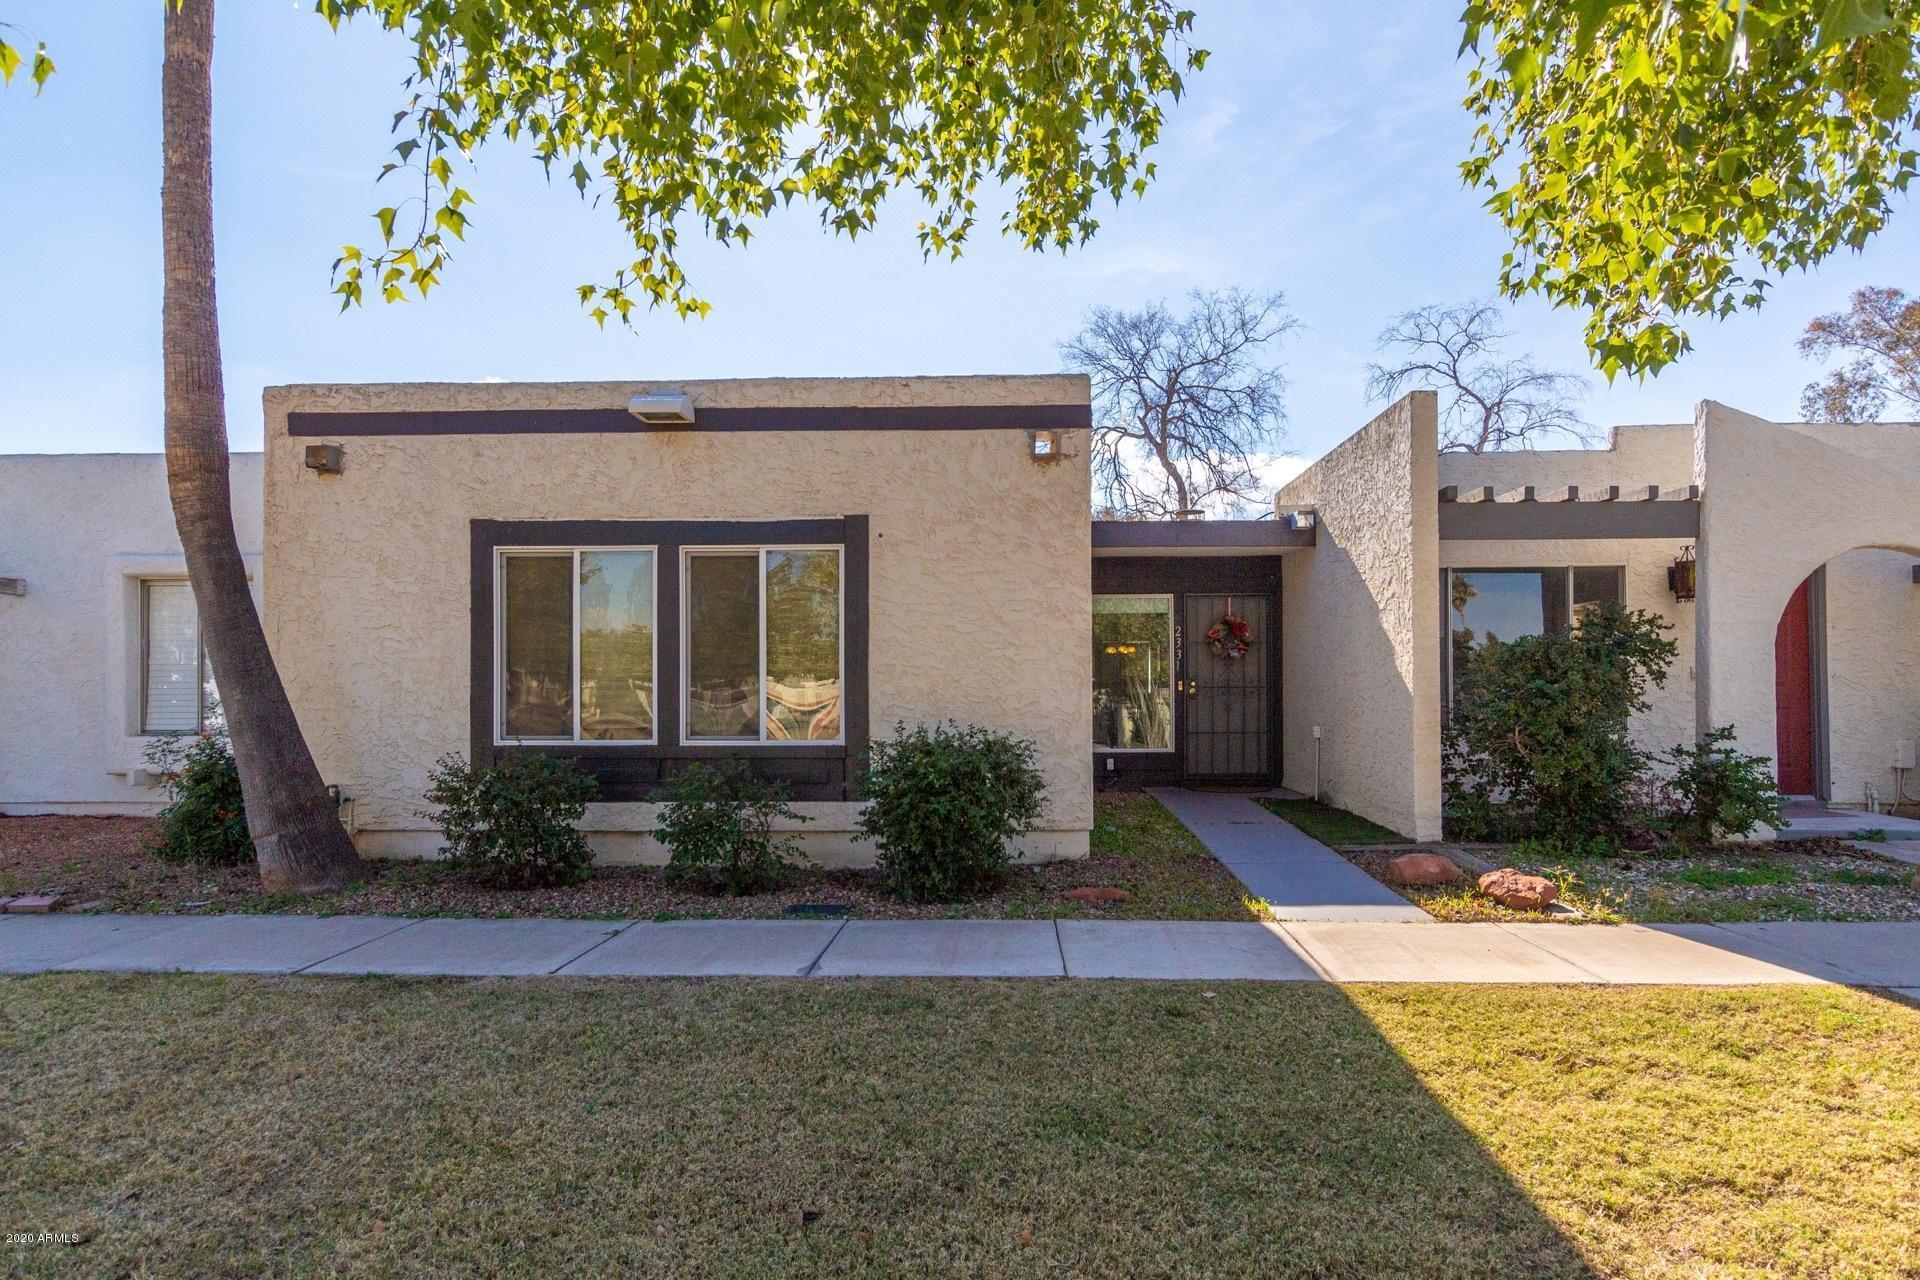 Photo of 2331 W Carson Drive, Tempe, AZ 85282